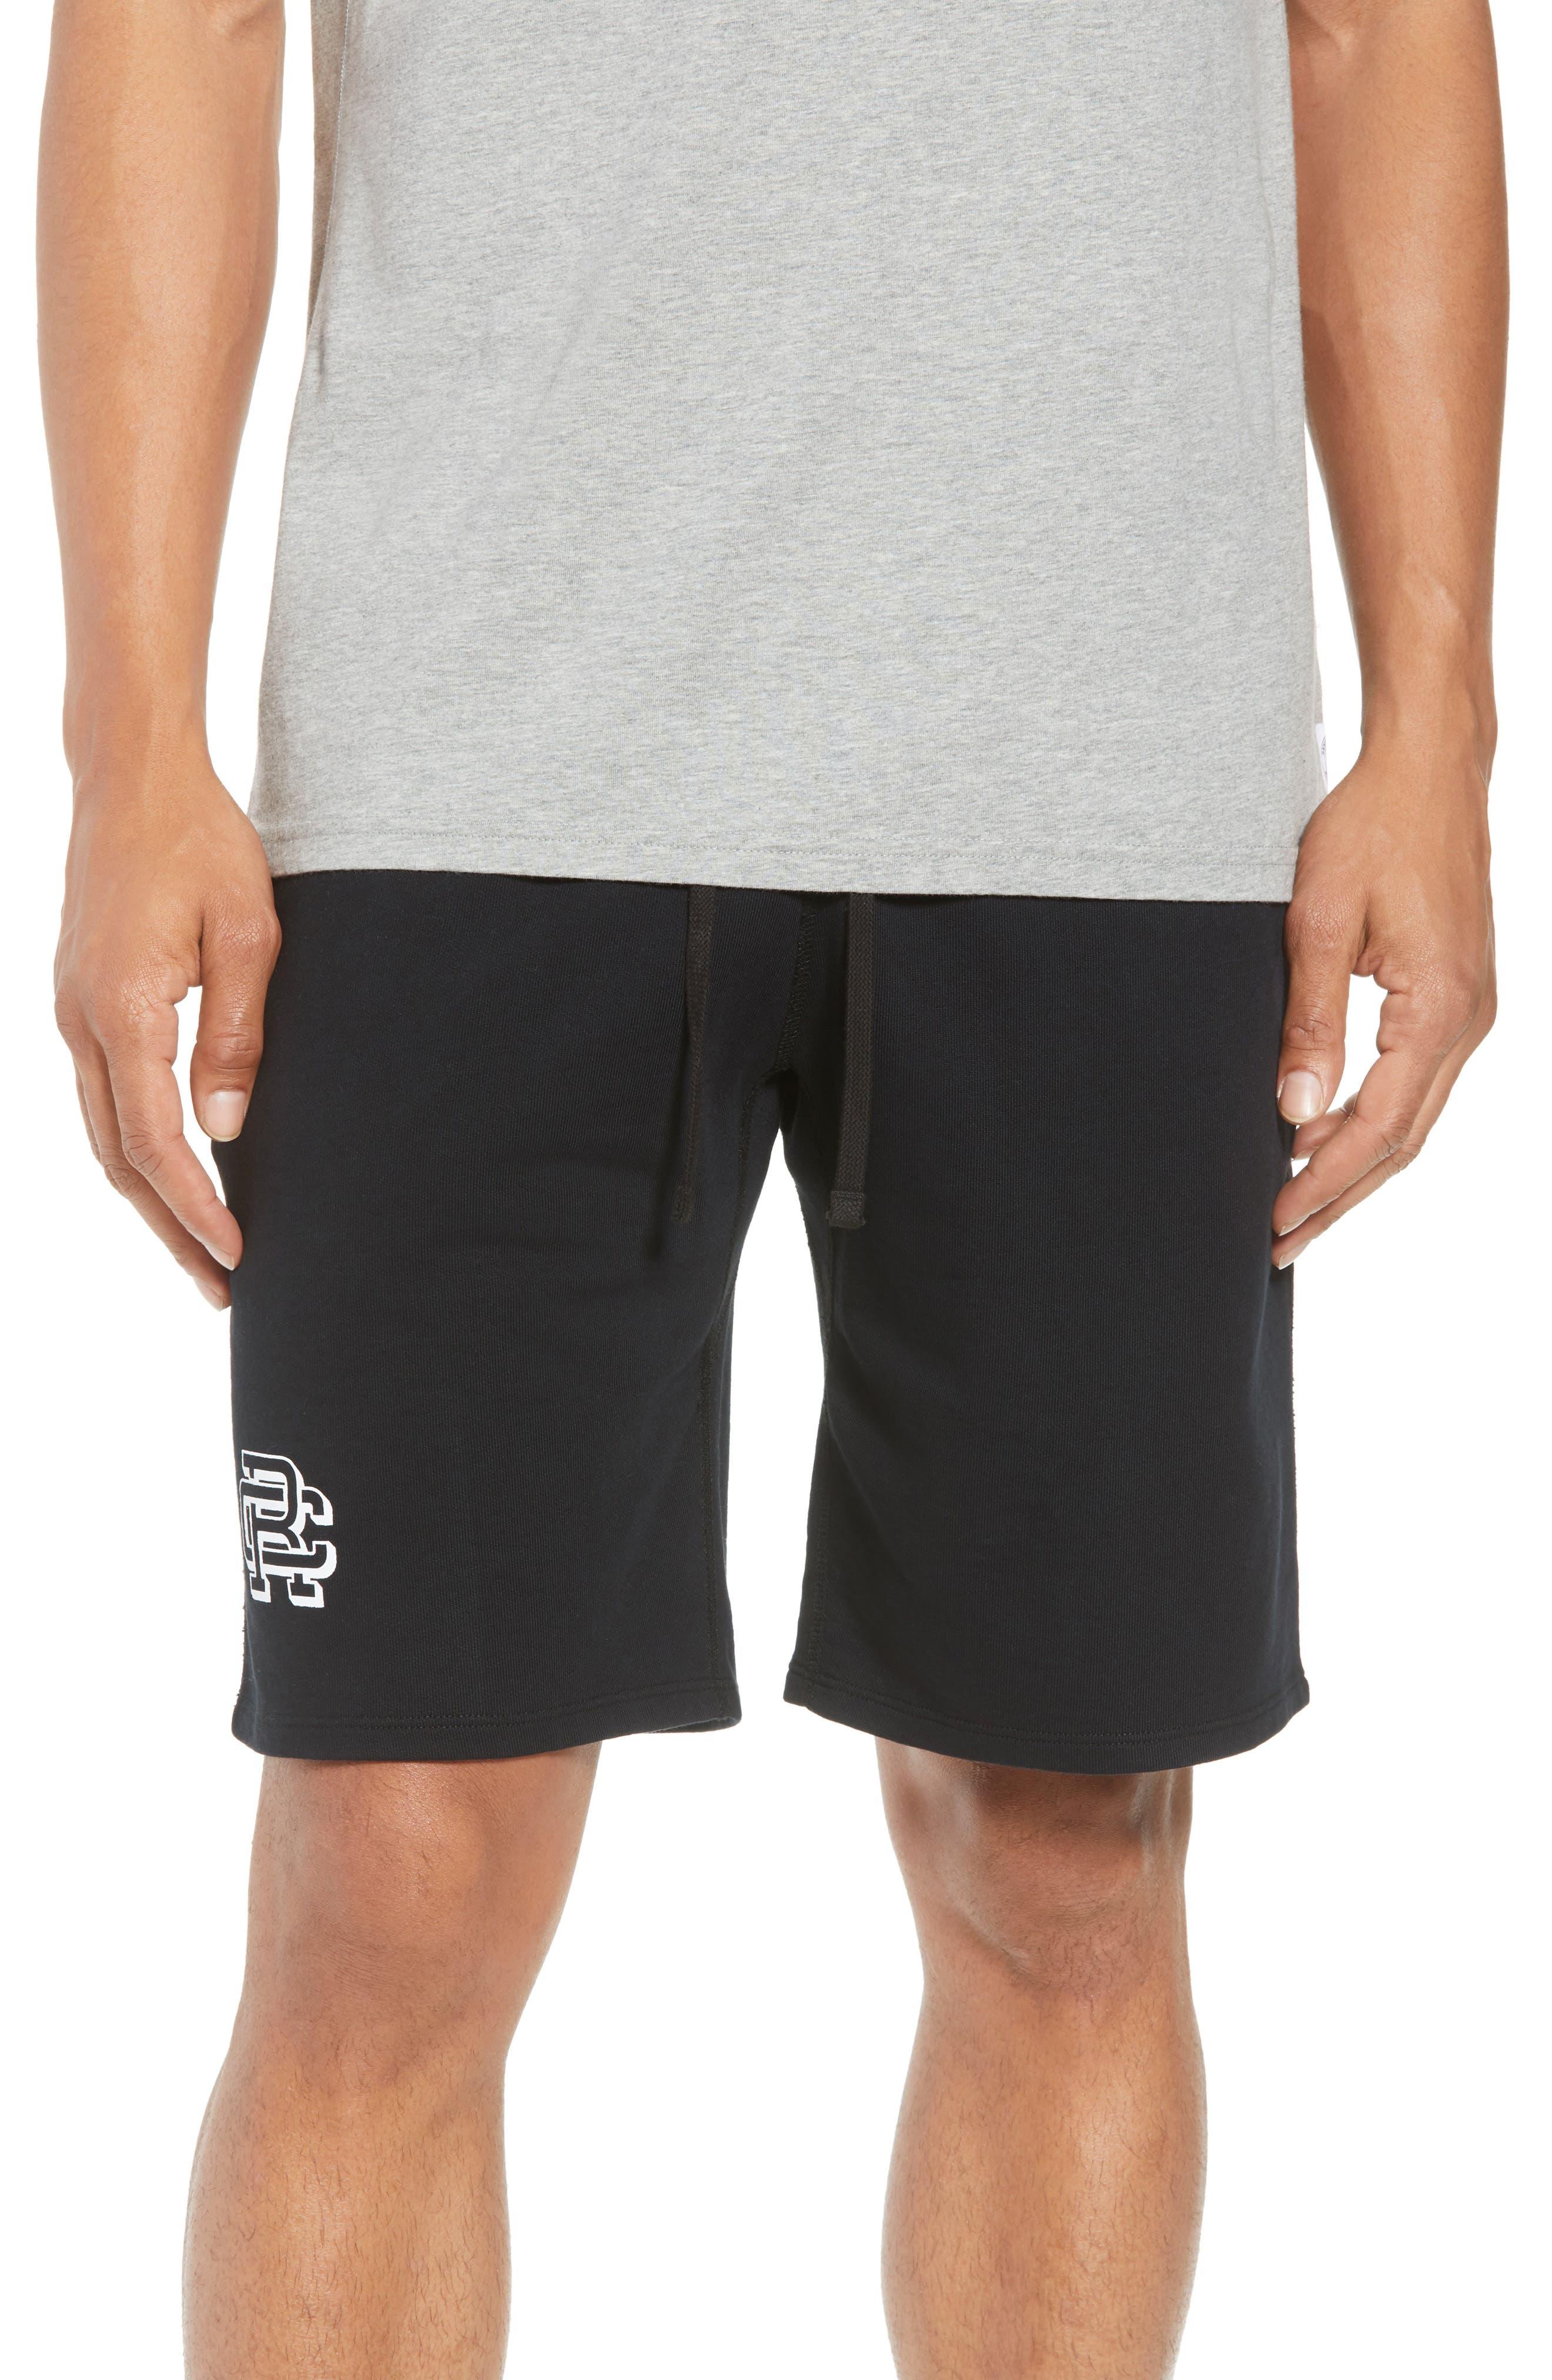 Shorts Lightweight Classic Fit Knit Shorts,                             Main thumbnail 1, color,                             BLACK